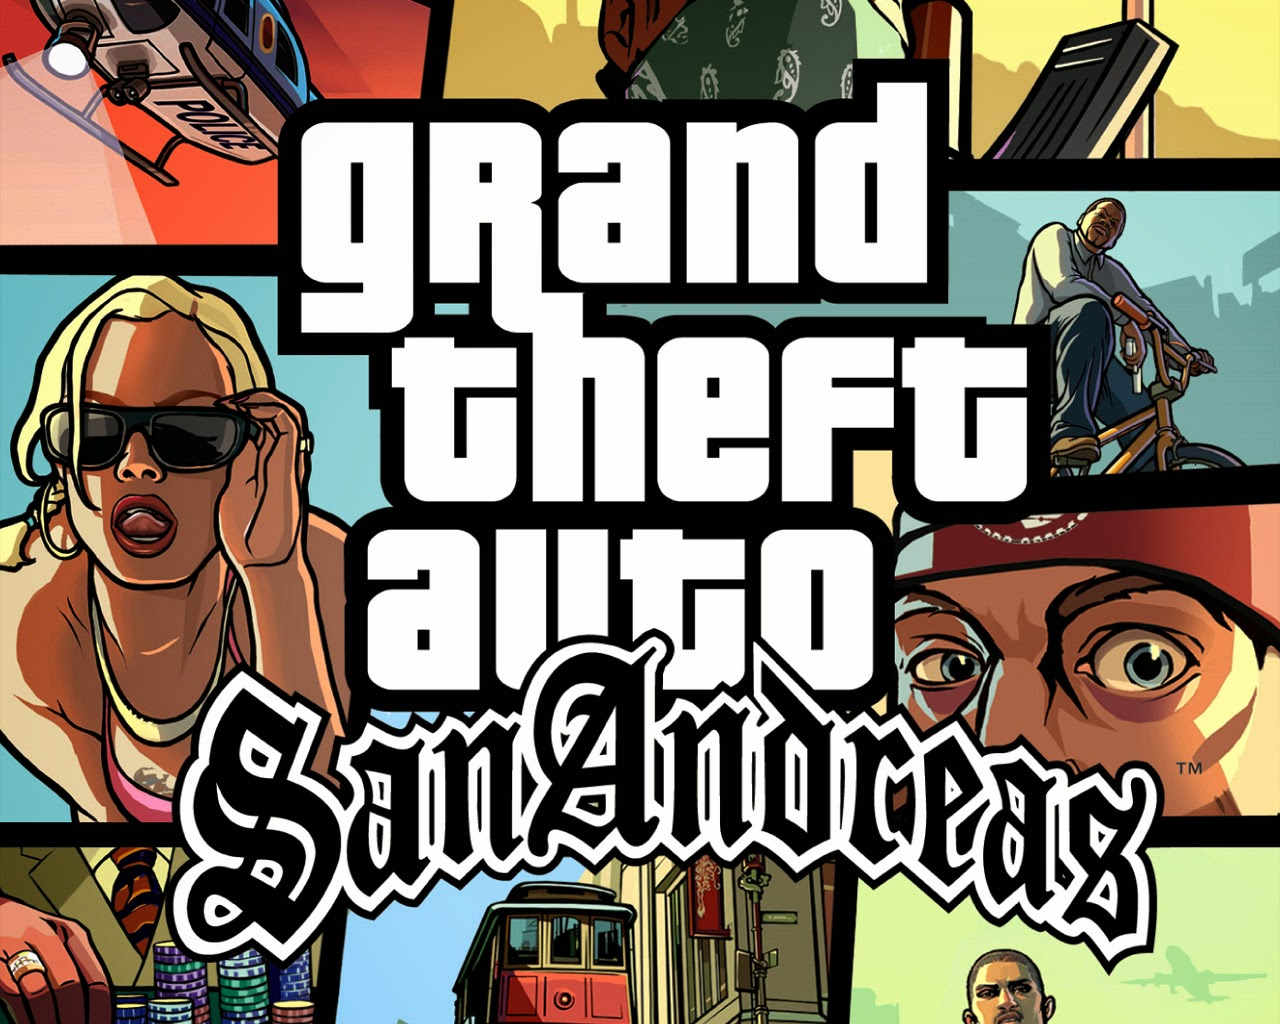 Guns Gta San Andreas Cheat Gta San Andreas Cheat Codes